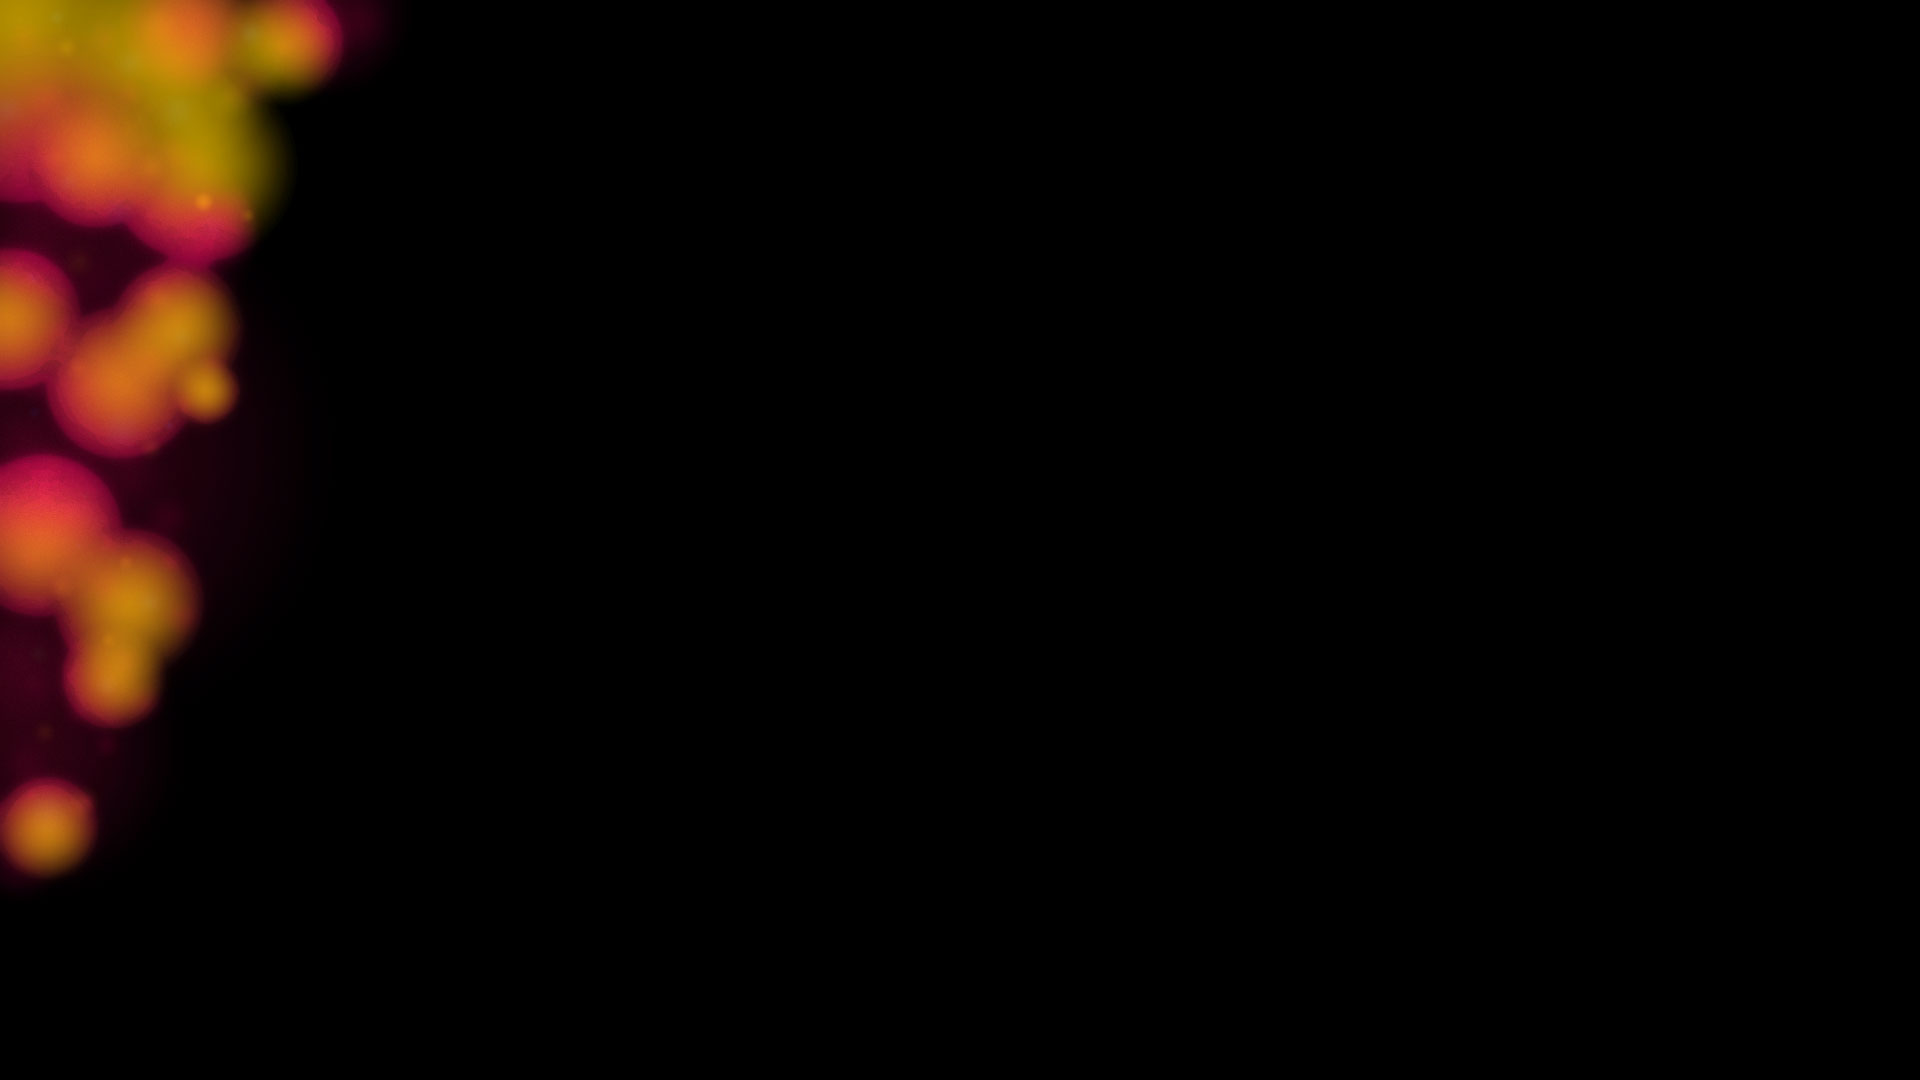 Black Backgrounds wallpaper   329861 1920x1080